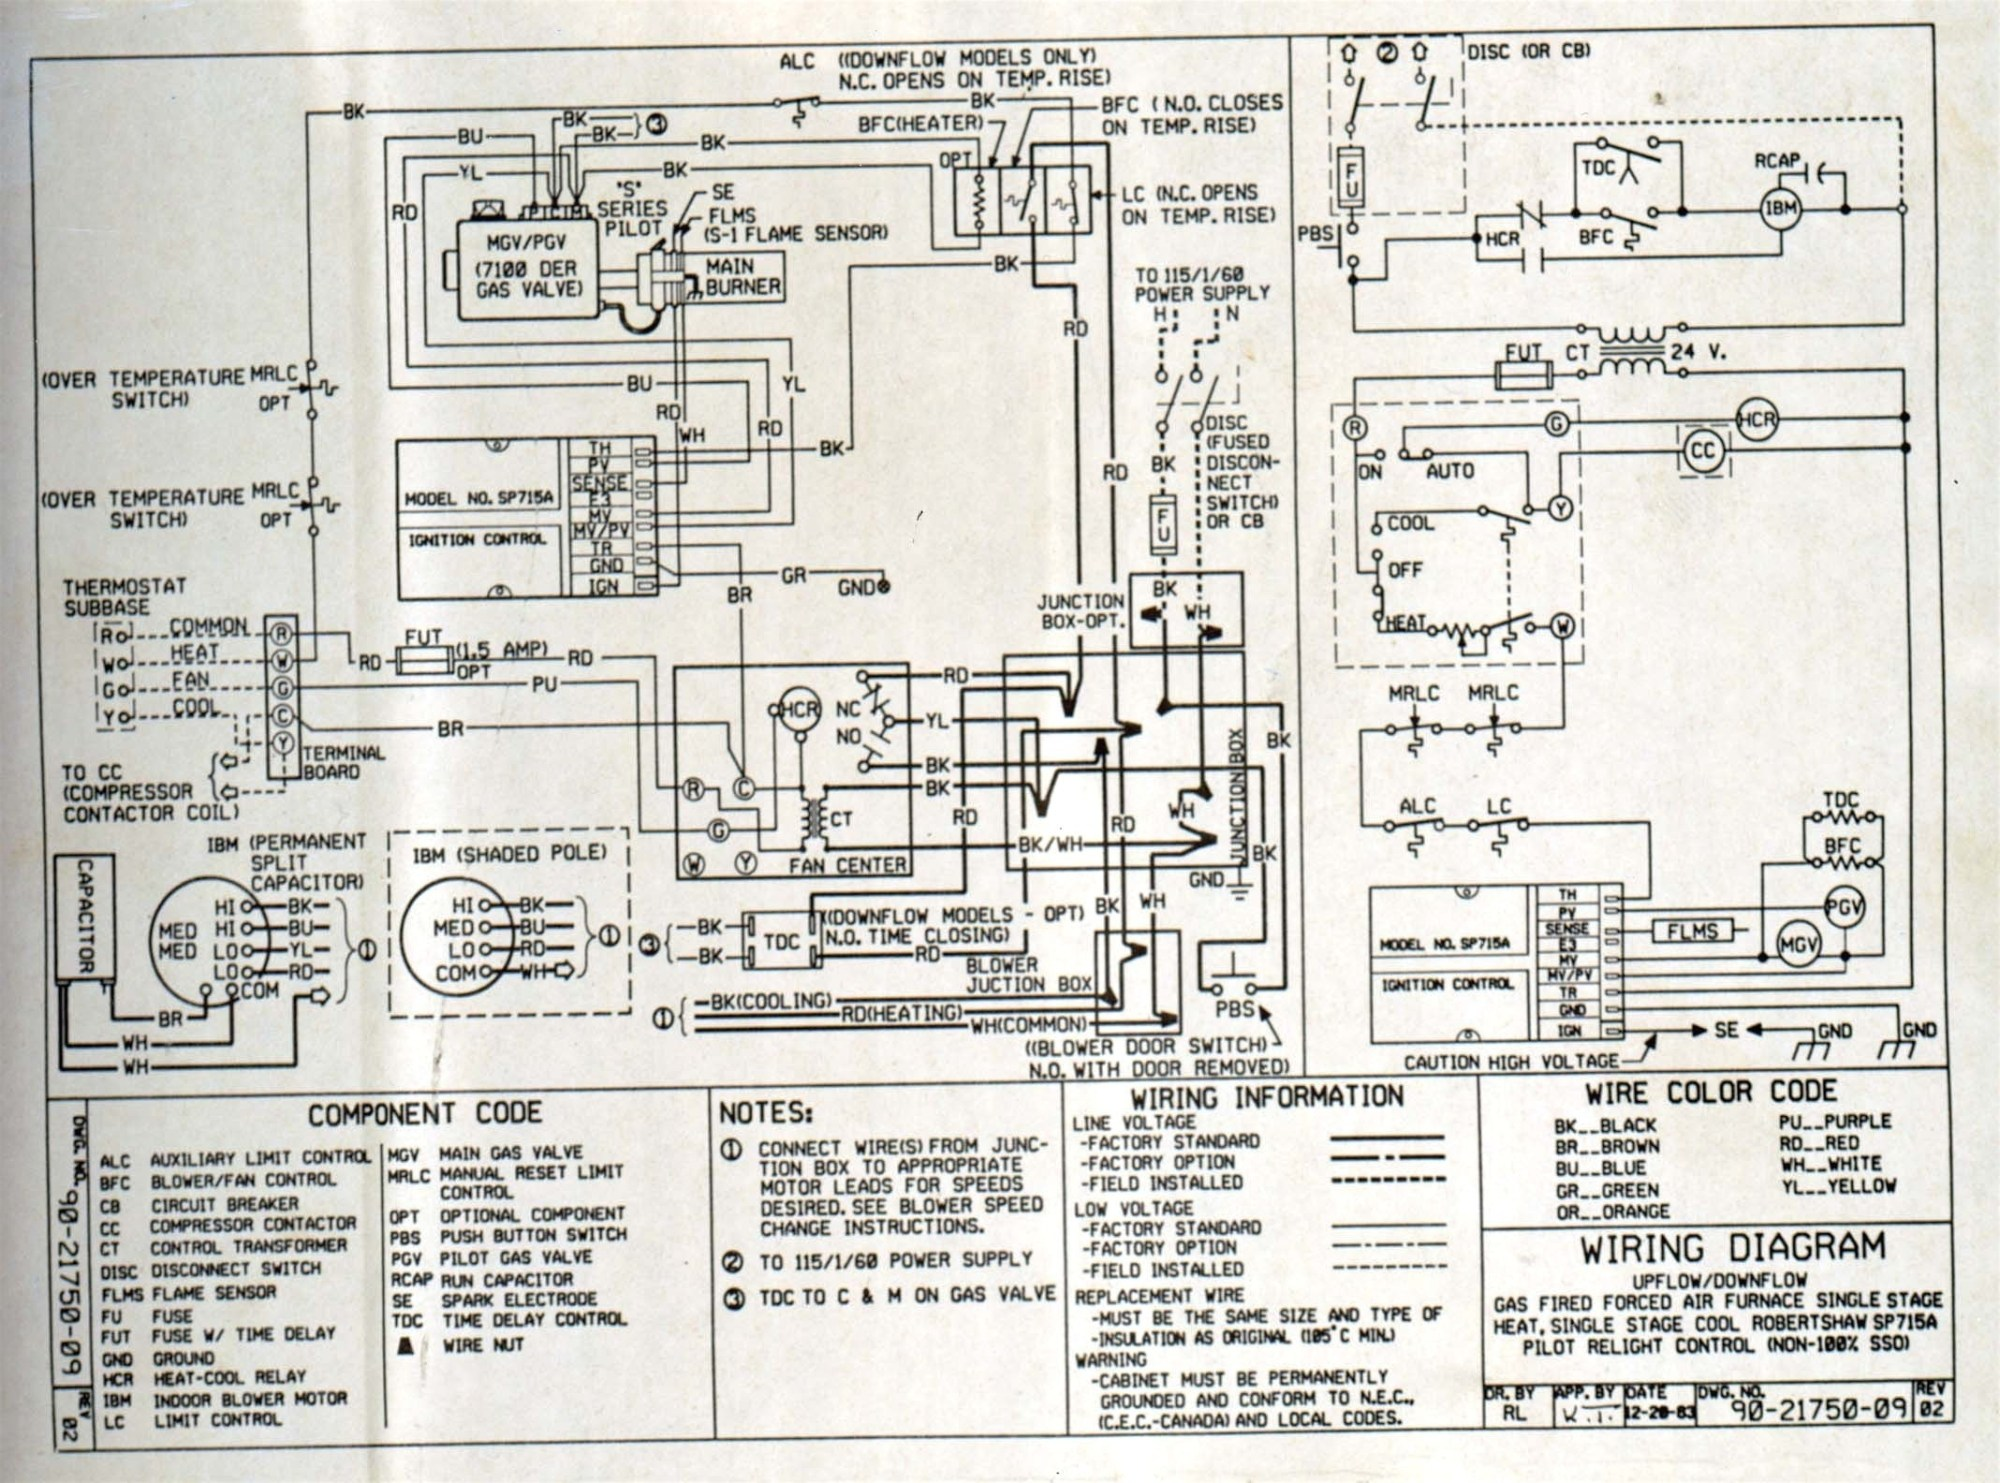 Dayton Heater Ga Valve Wiring Diagram - honeywell 24 volt ... on